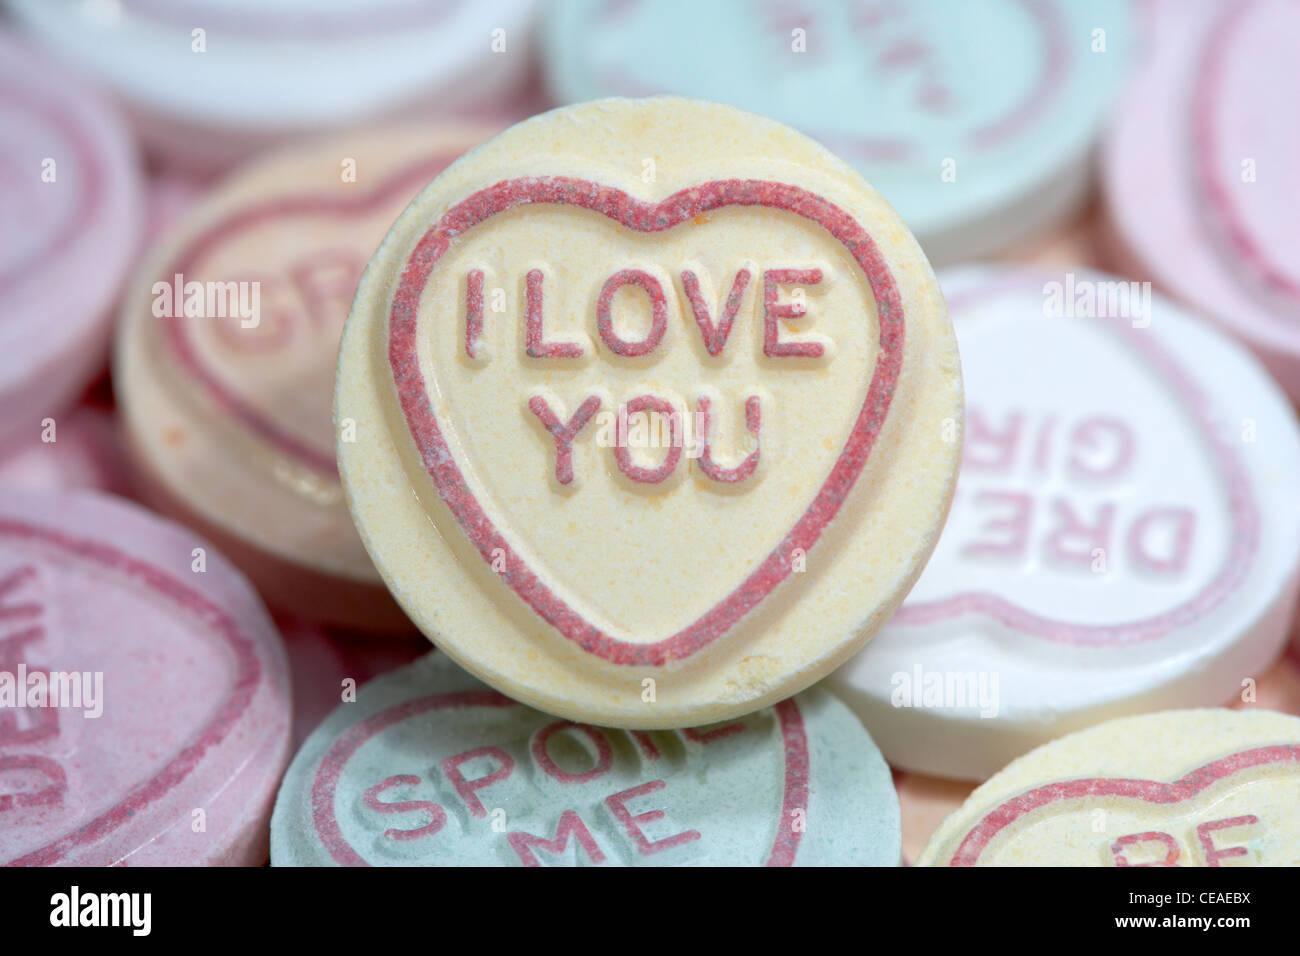 I Love You Imágenes De Stock I Love You Fotos De Stock: I Love You Amongst Love Heart Sweets Stock Photo, Royalty